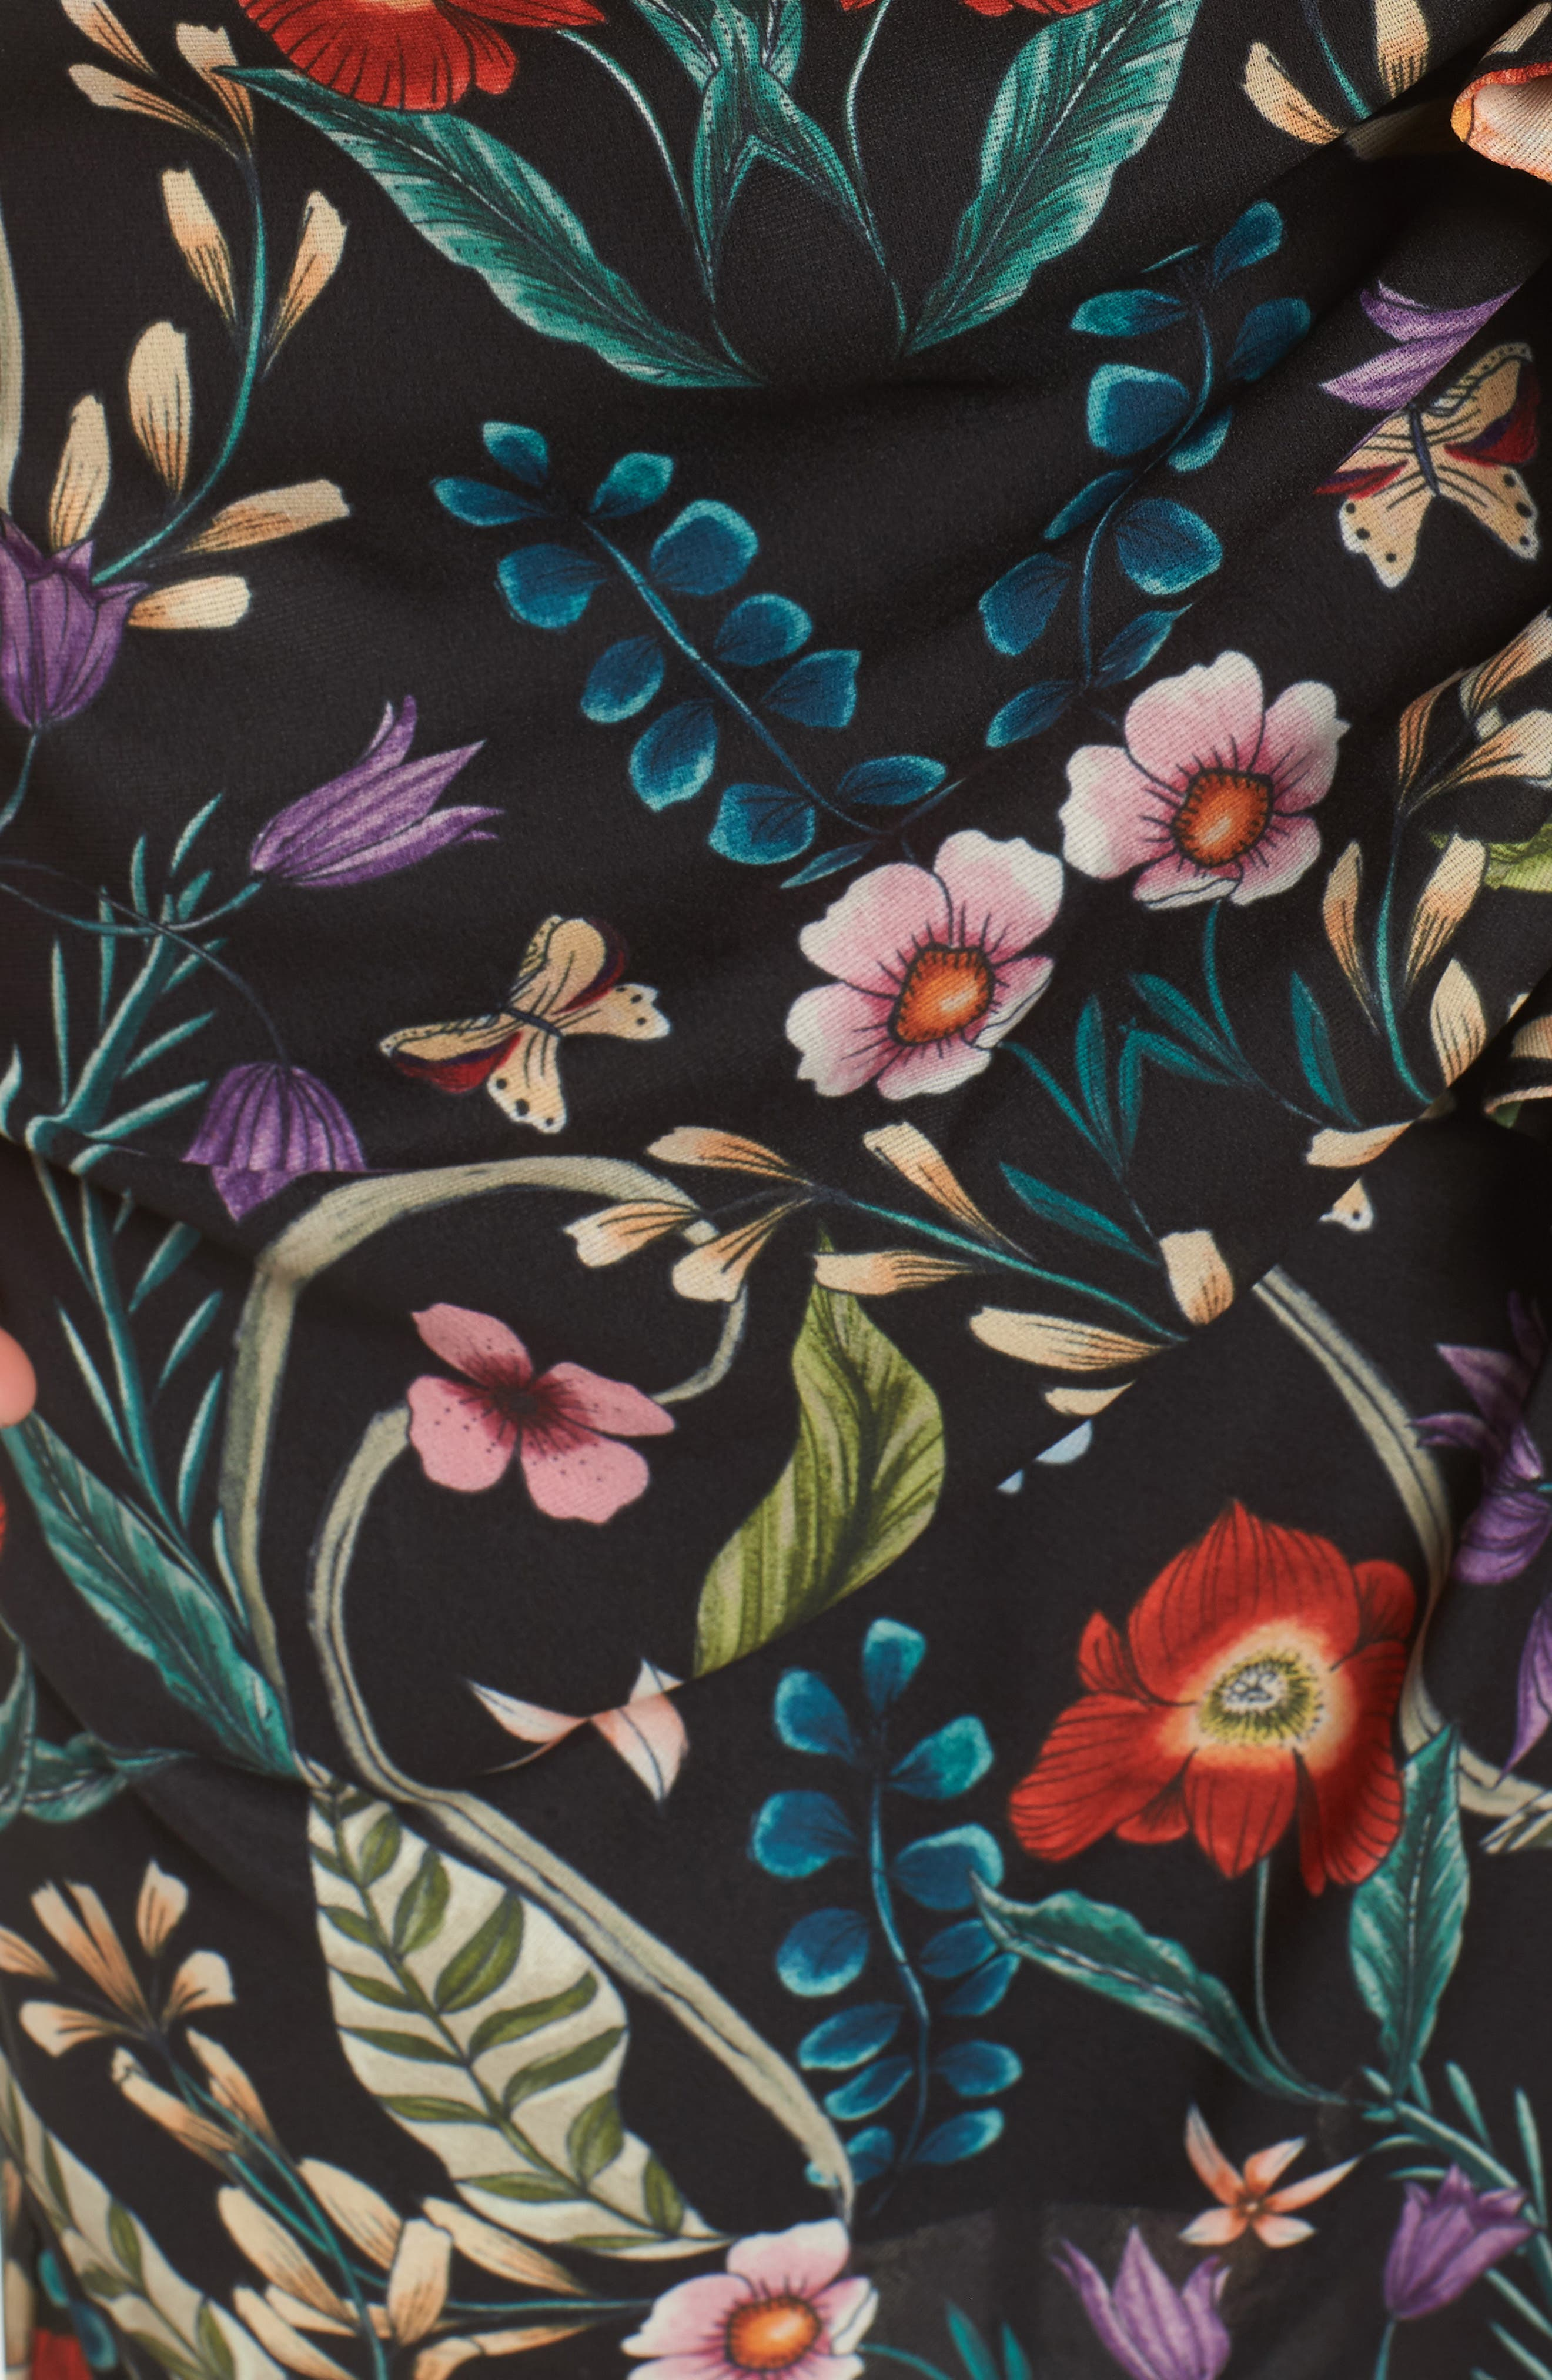 Gardenia Ruffle Dress,                             Alternate thumbnail 5, color,                             Print Dark